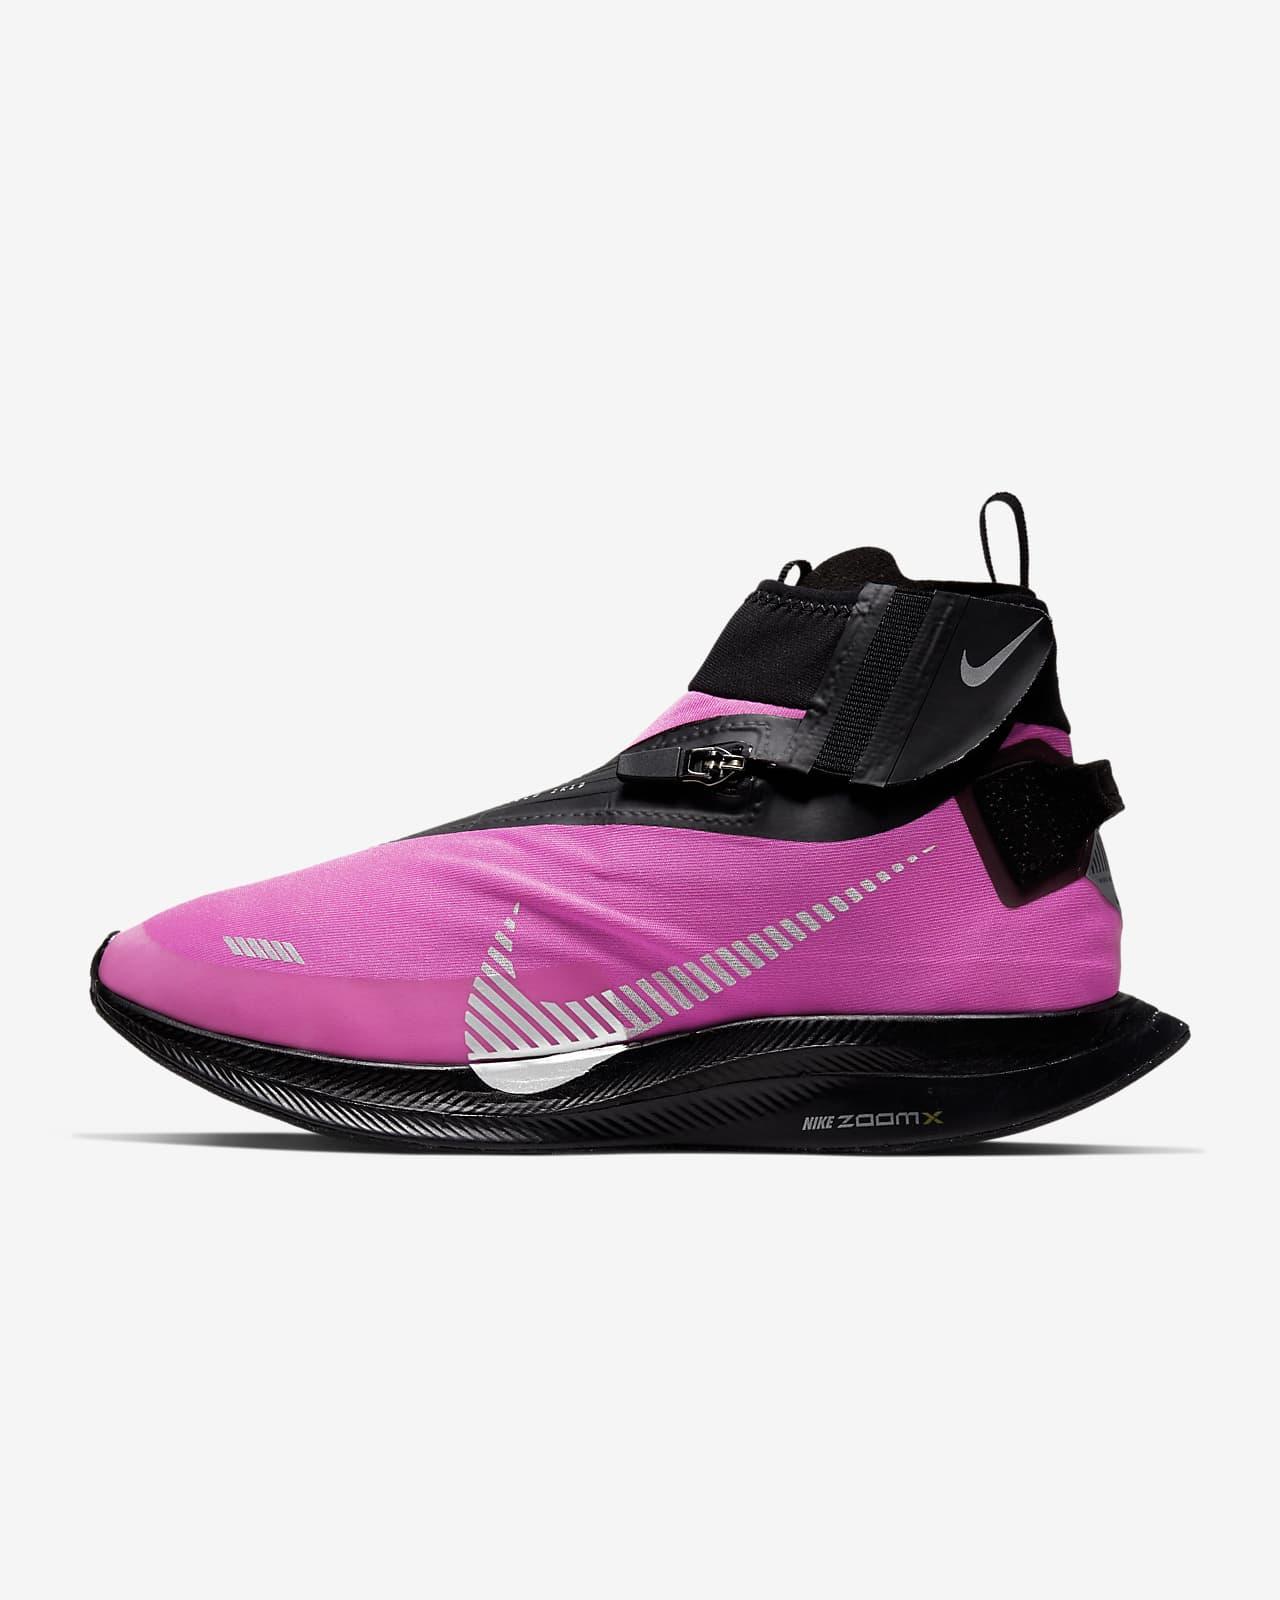 Nike Zoom Pegasus Turbo Shield Hardloopschoen voor dames